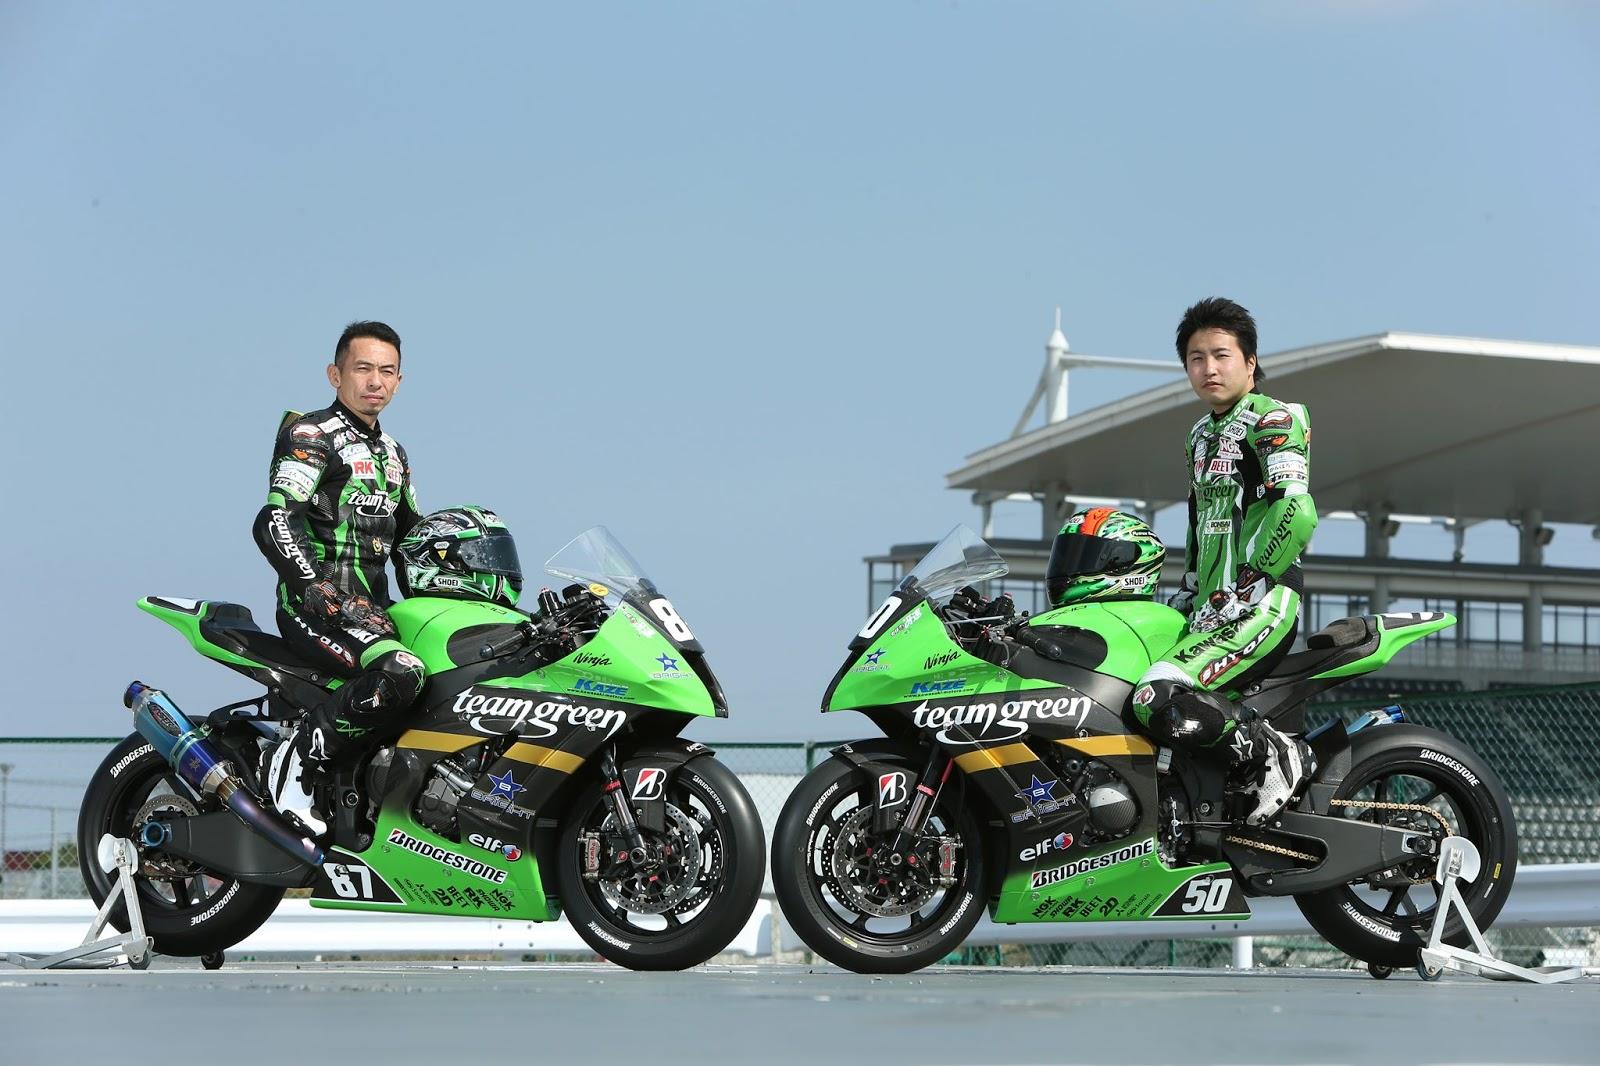 Planet Japan Blog: All Japan Superbike - Kawasaki ZX-10R Team Green